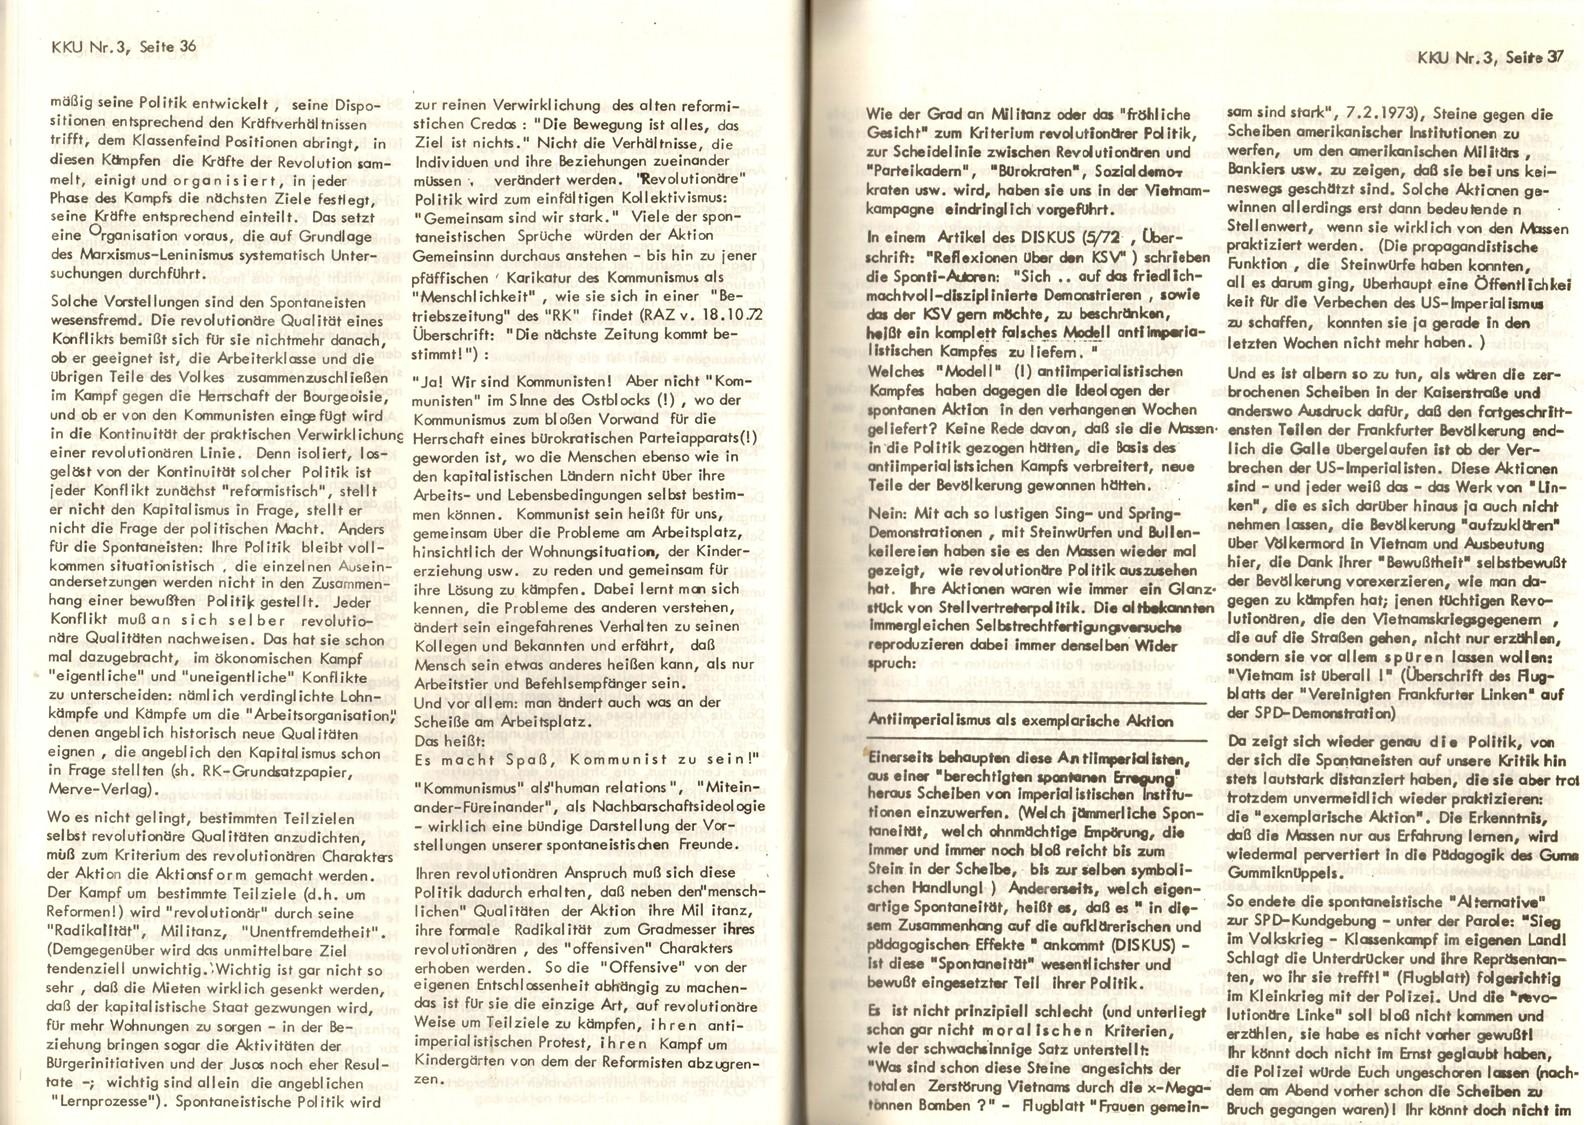 Frankfurt_Offenbach_KG_Kampf_Kritik_Umgestaltung_1973_03_20